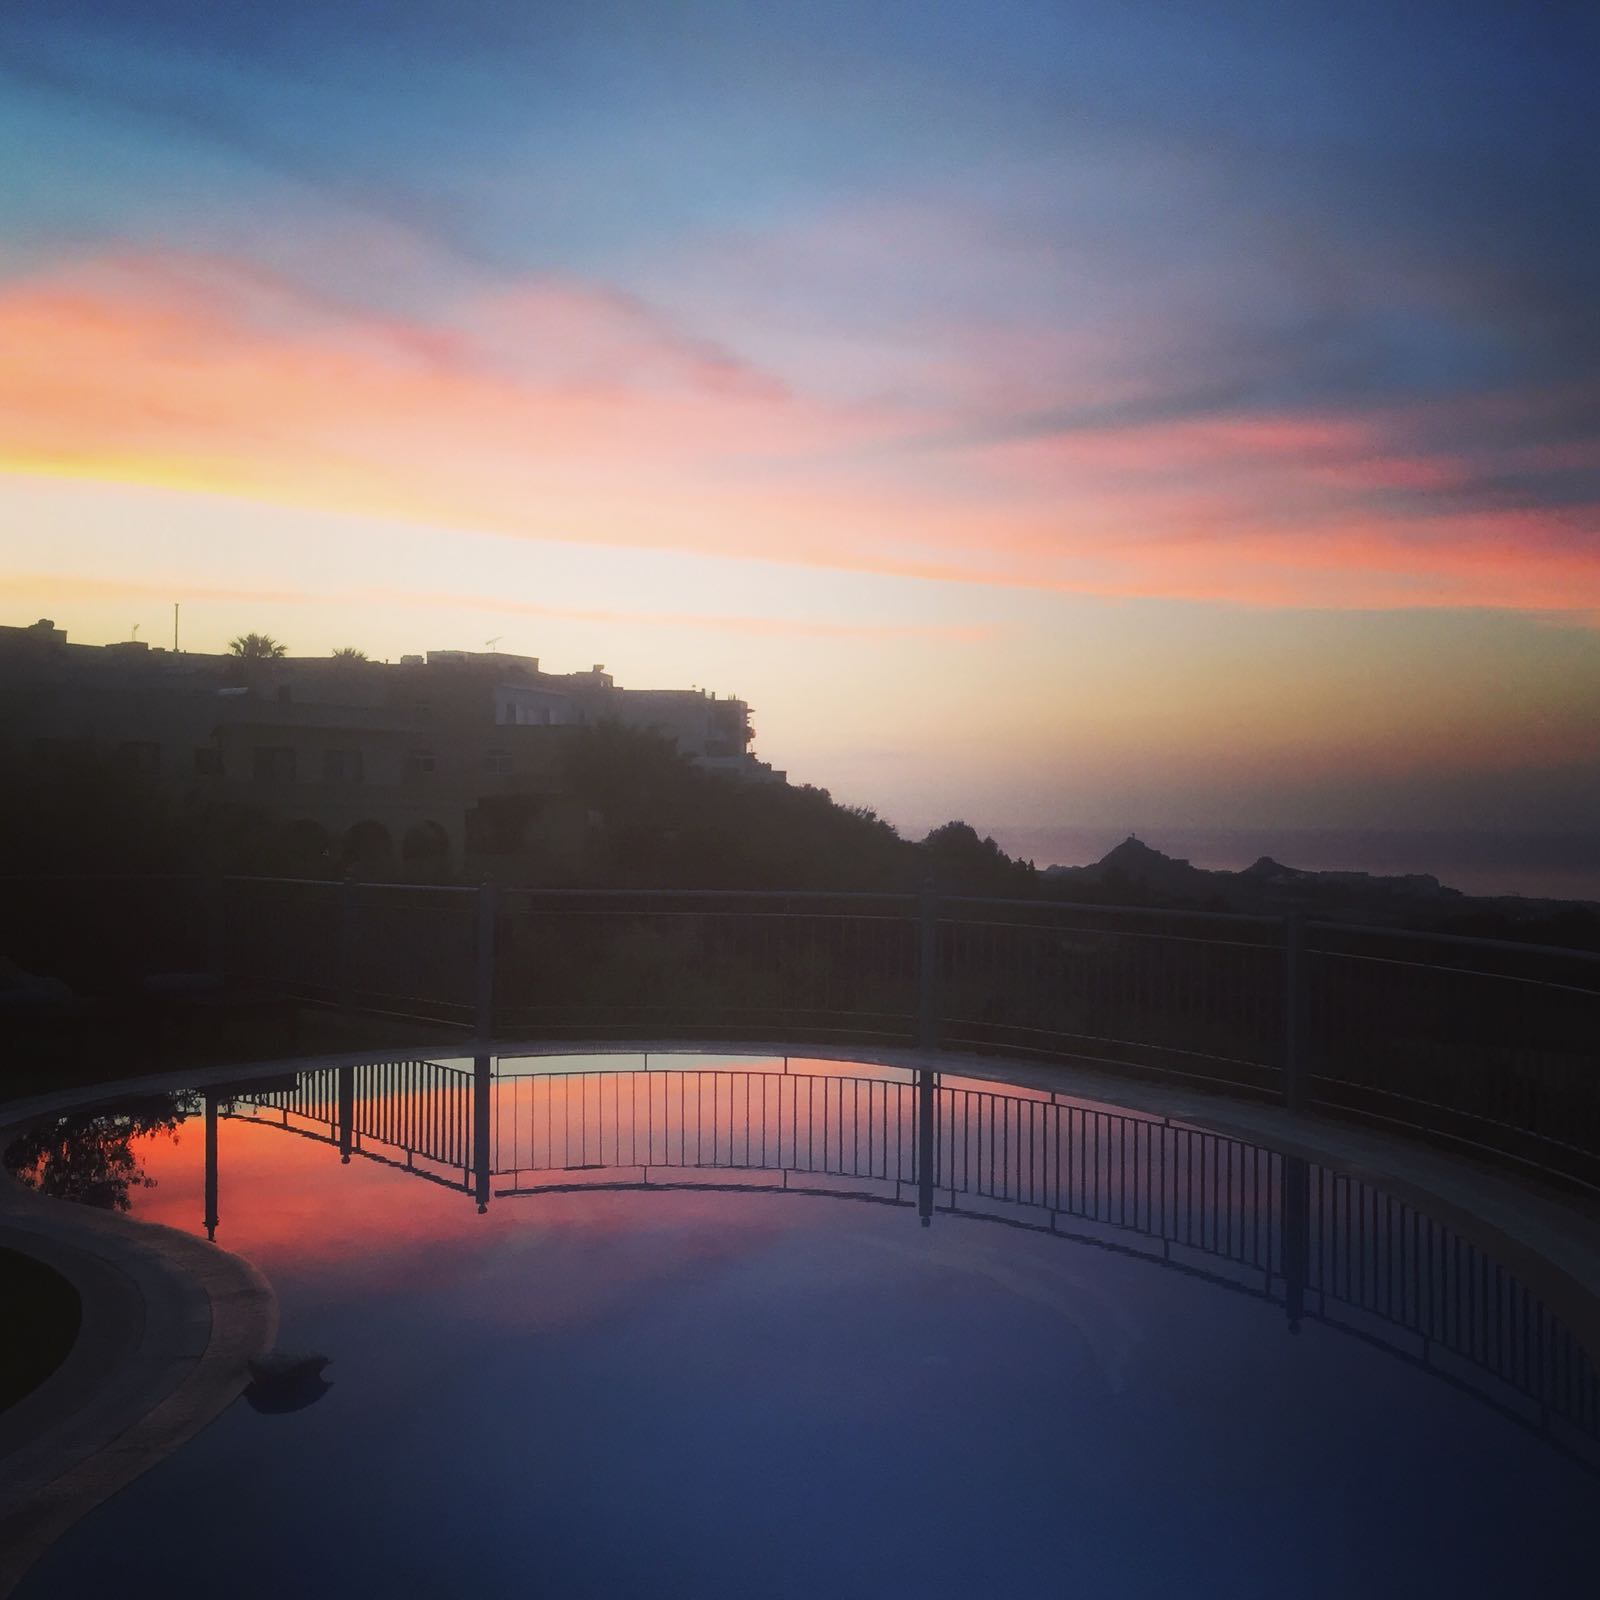 Copy of sunset.jpeg